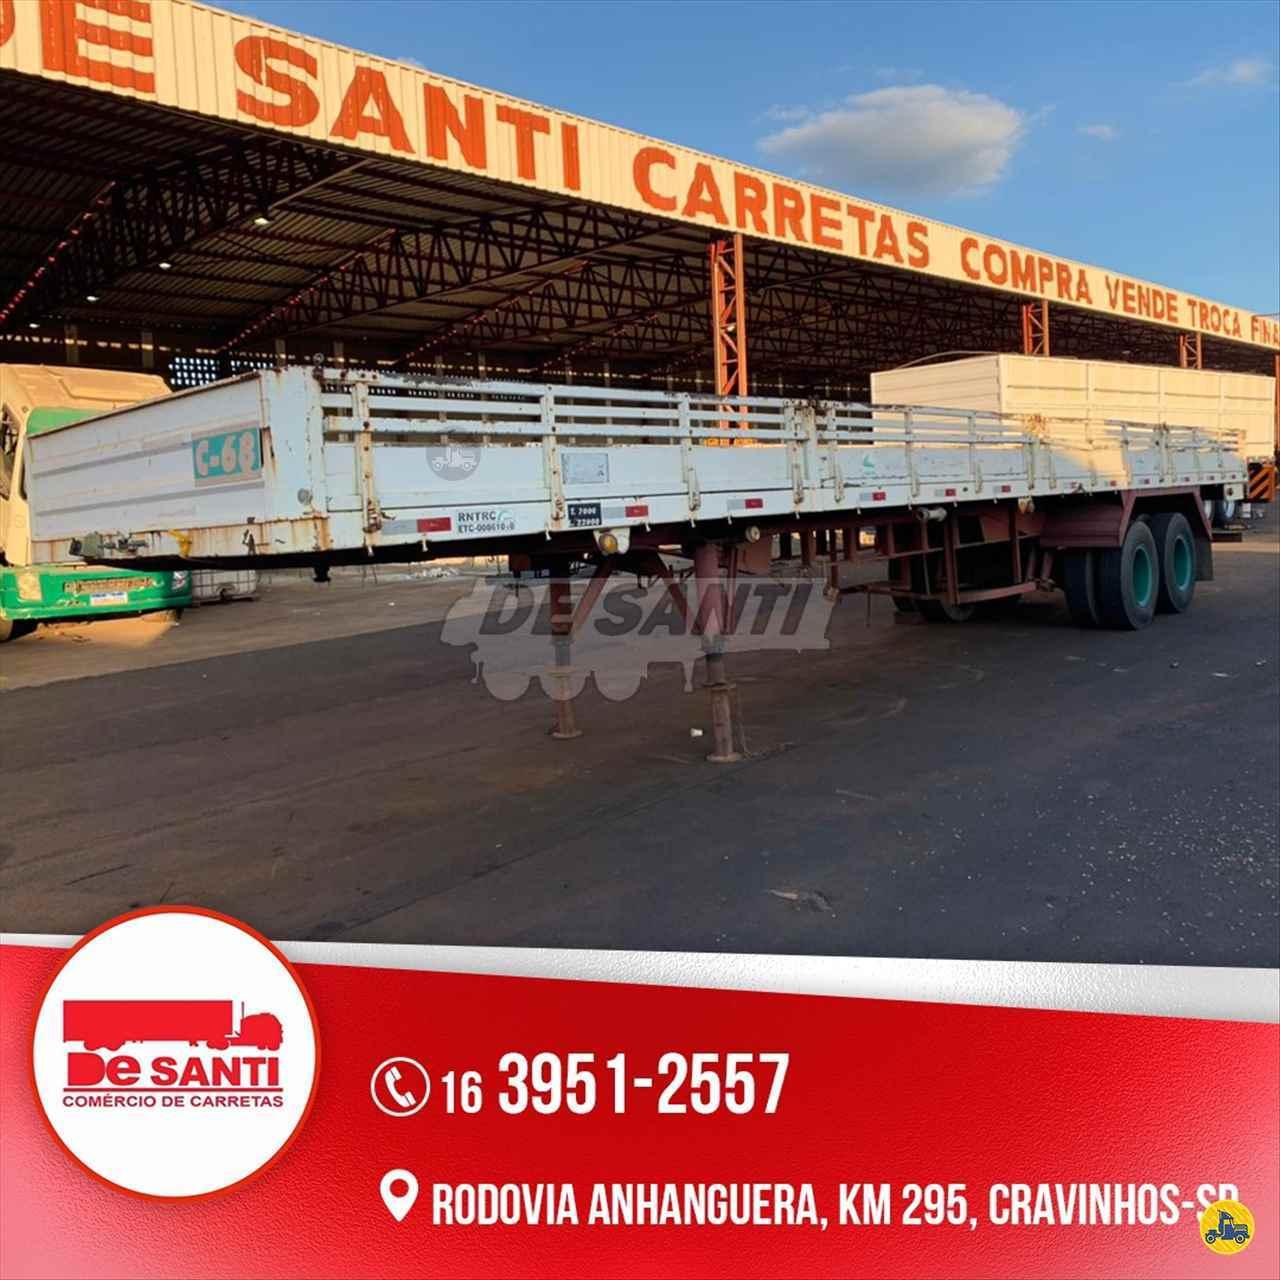 CARRETA SEMI-REBOQUE CARGA SECA De Santi Carretas CRAVINHOS SÃO PAULO SP